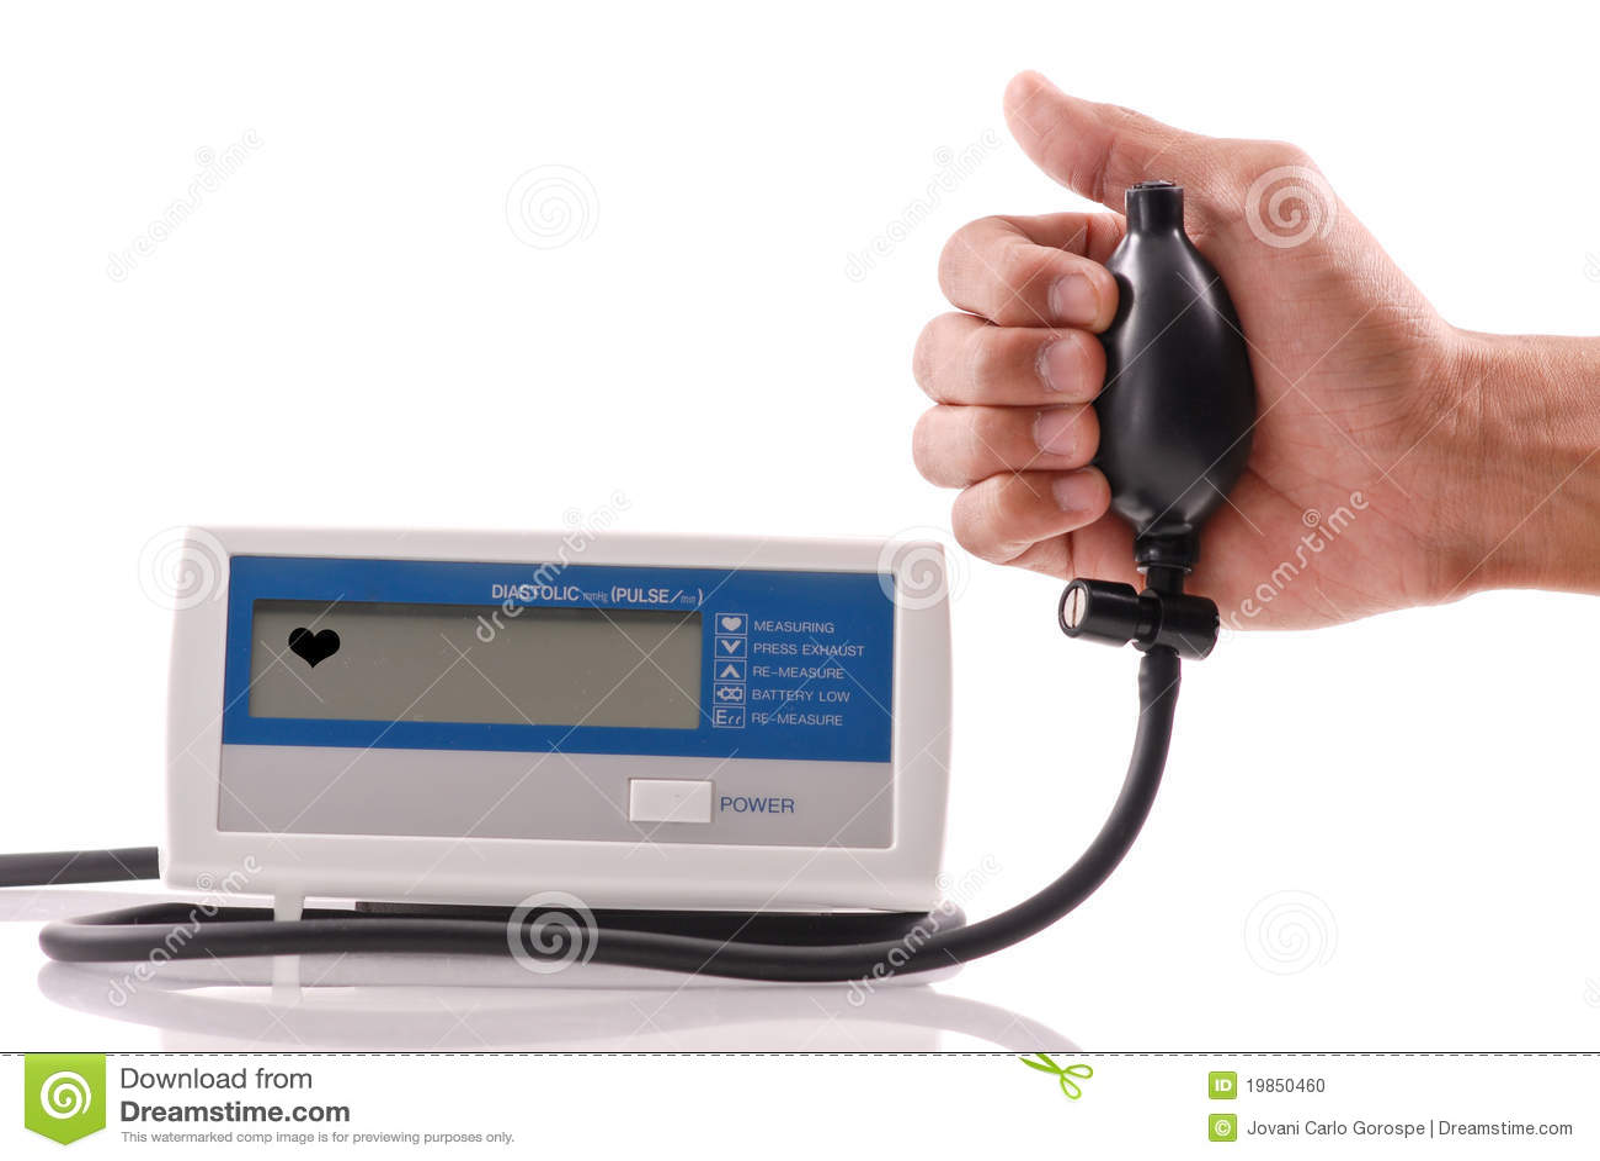 high blood pressure machine price